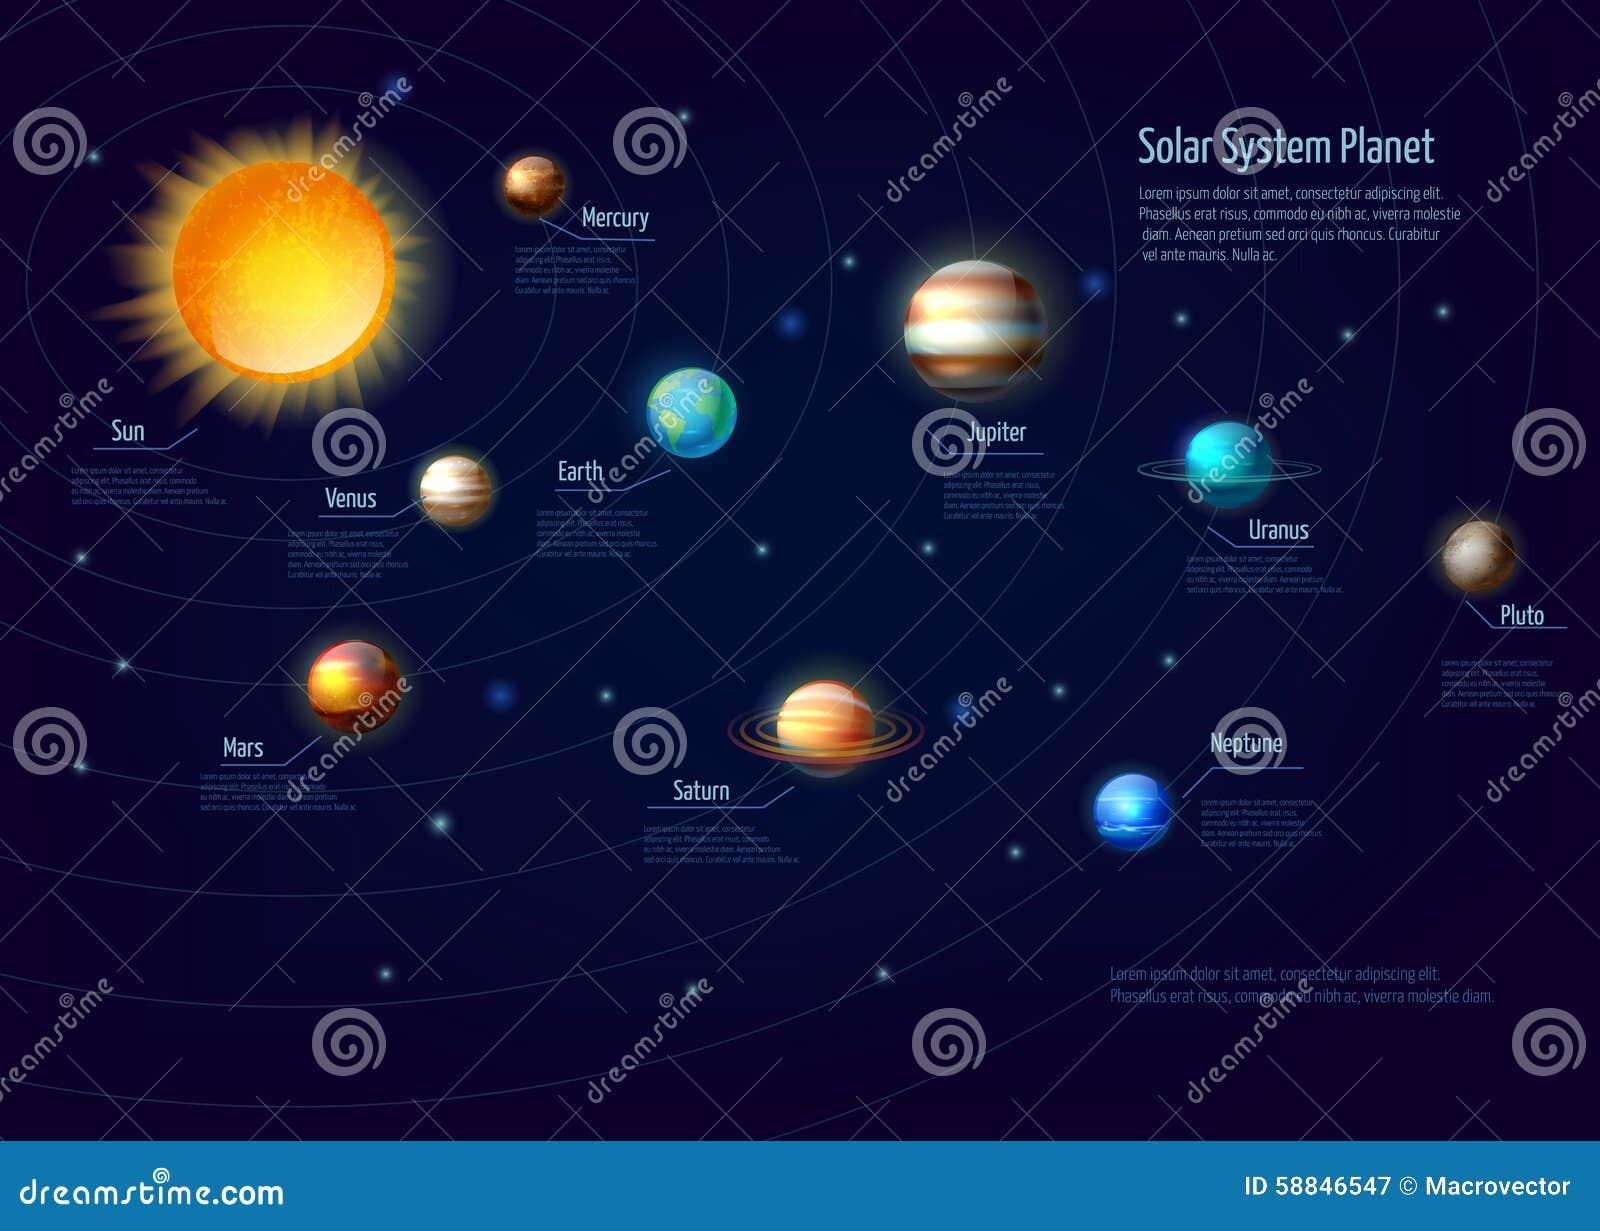 太阳系行星Infographic集合